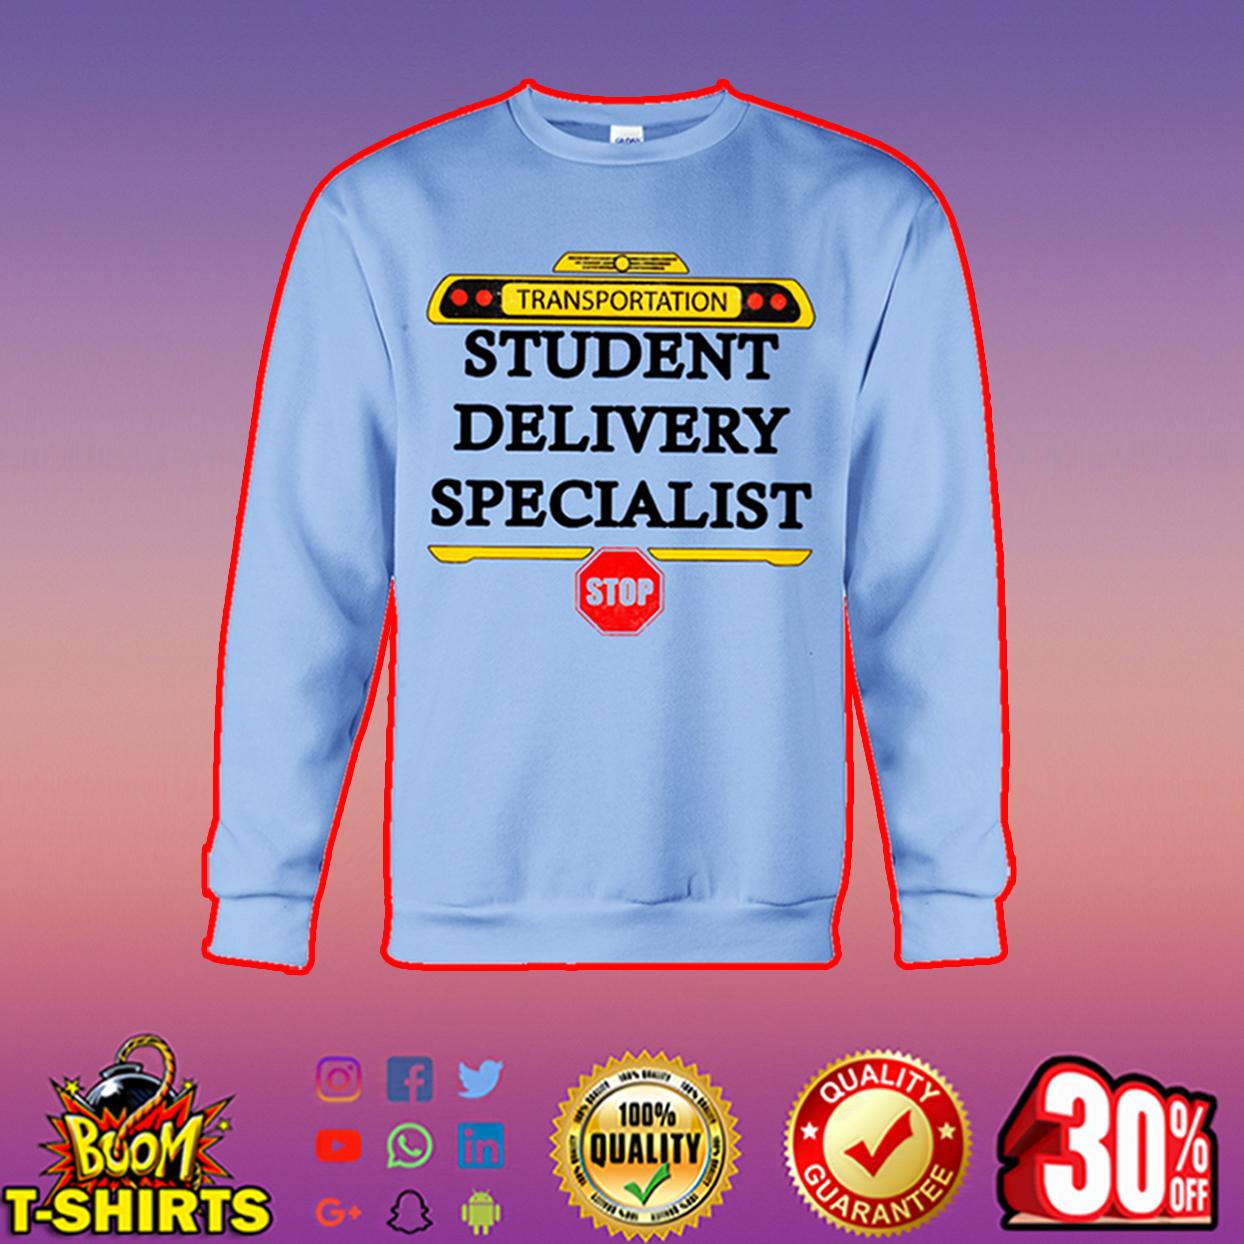 Transportation student delivery specialist sweatshirt